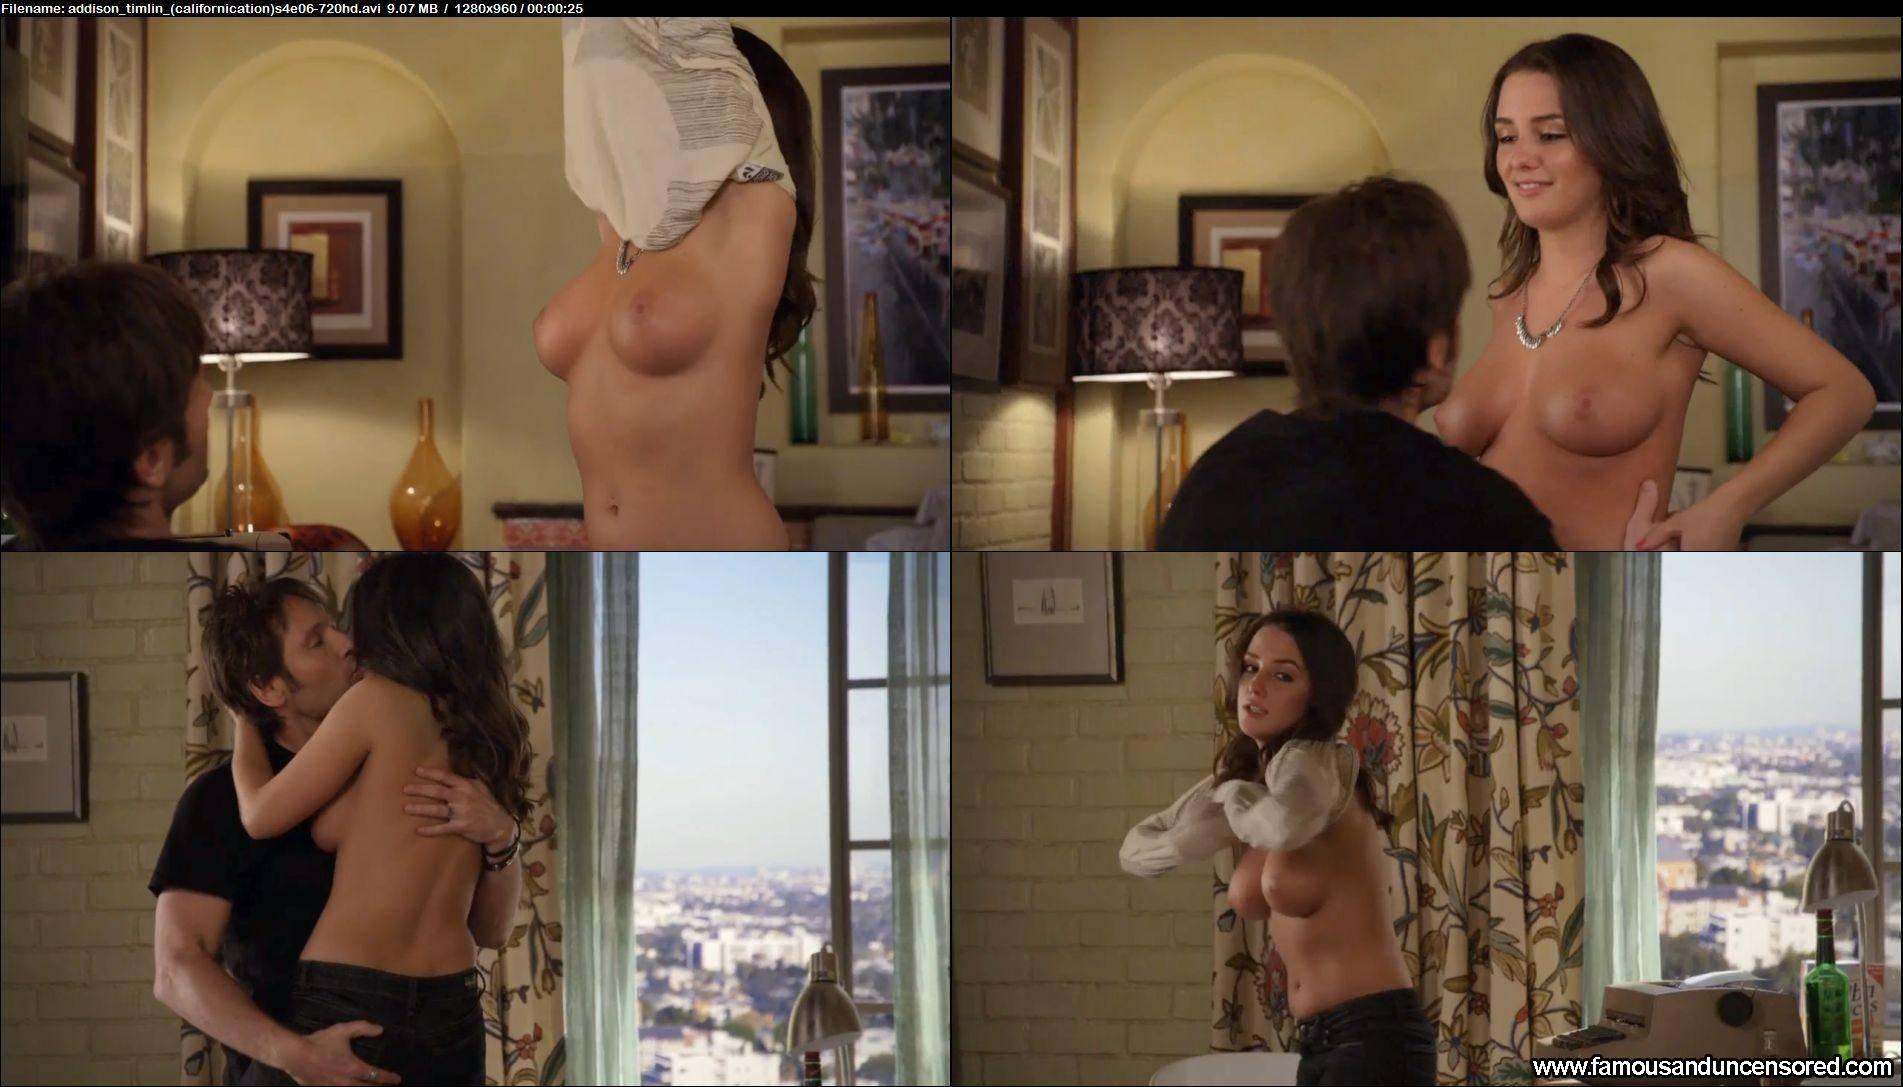 Addison timlin nude scene